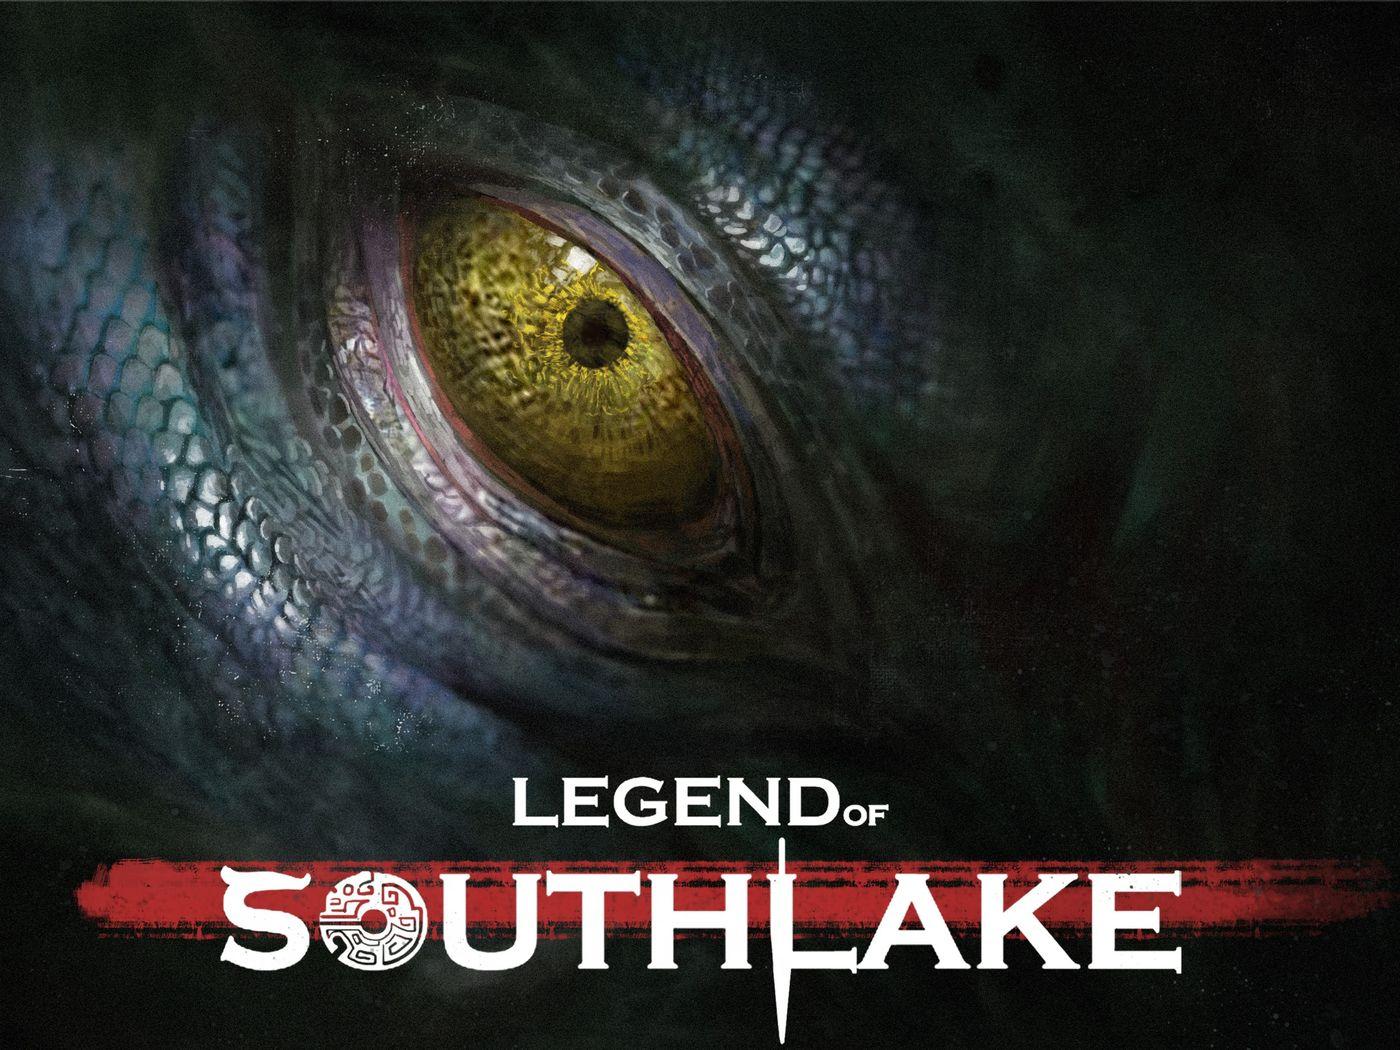 Legend of South Lake